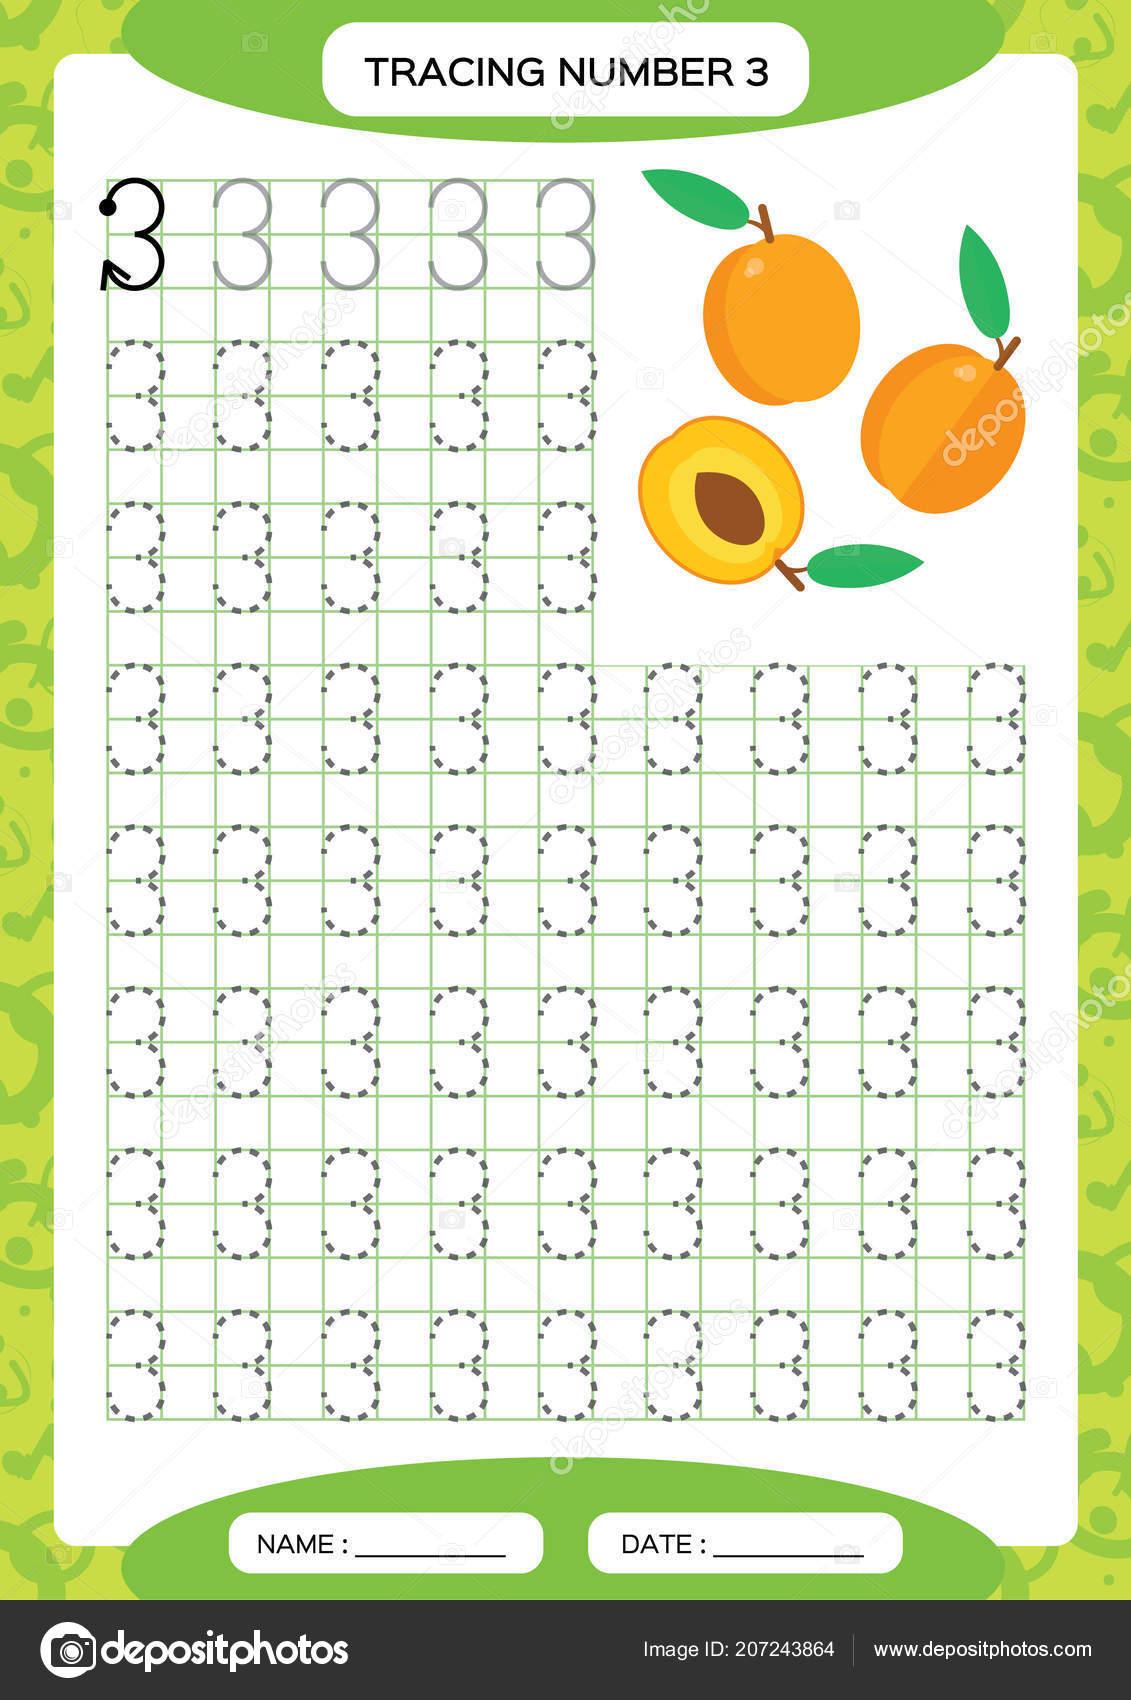 Numero Hoja Trabajo Seguimiento Tres Fruta Naranja